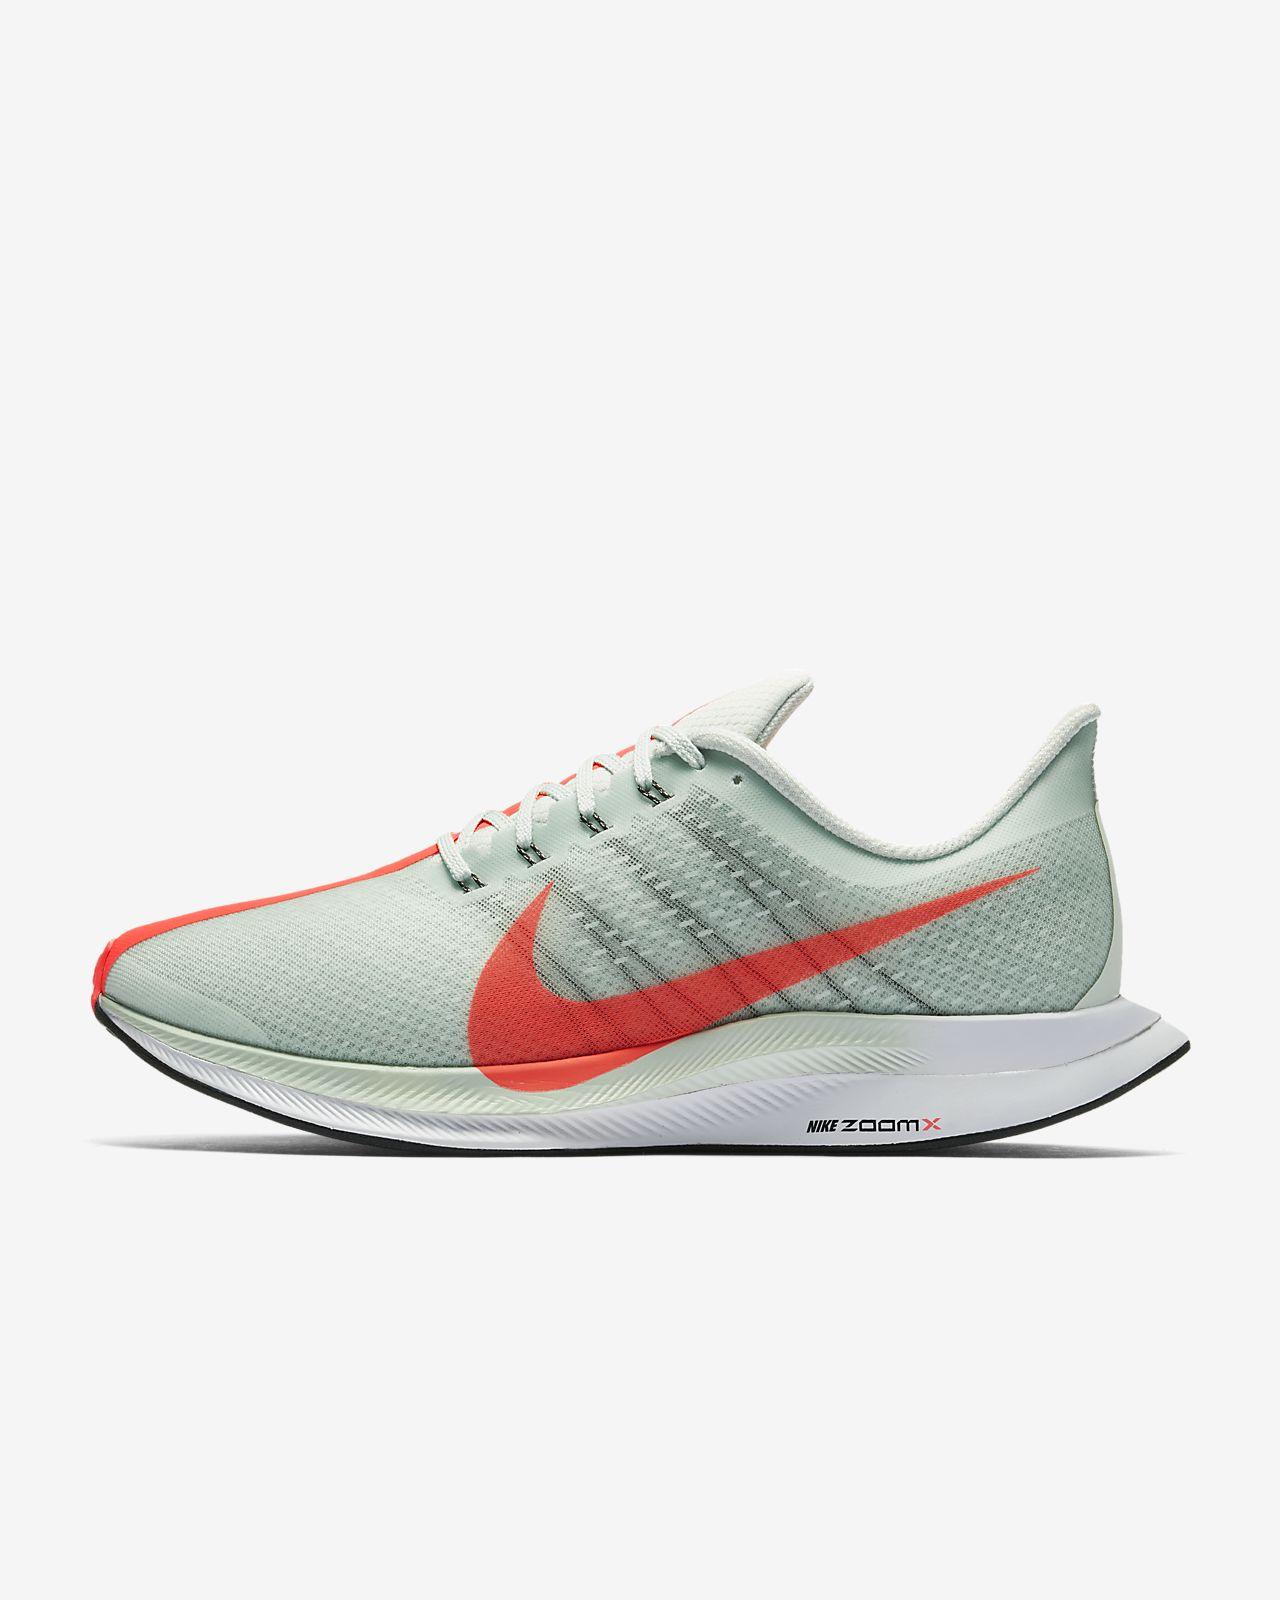 best sneakers 9f45f eb42a calzado-de-running-zoom-pegasus-turbo-k1h8qb.jpg